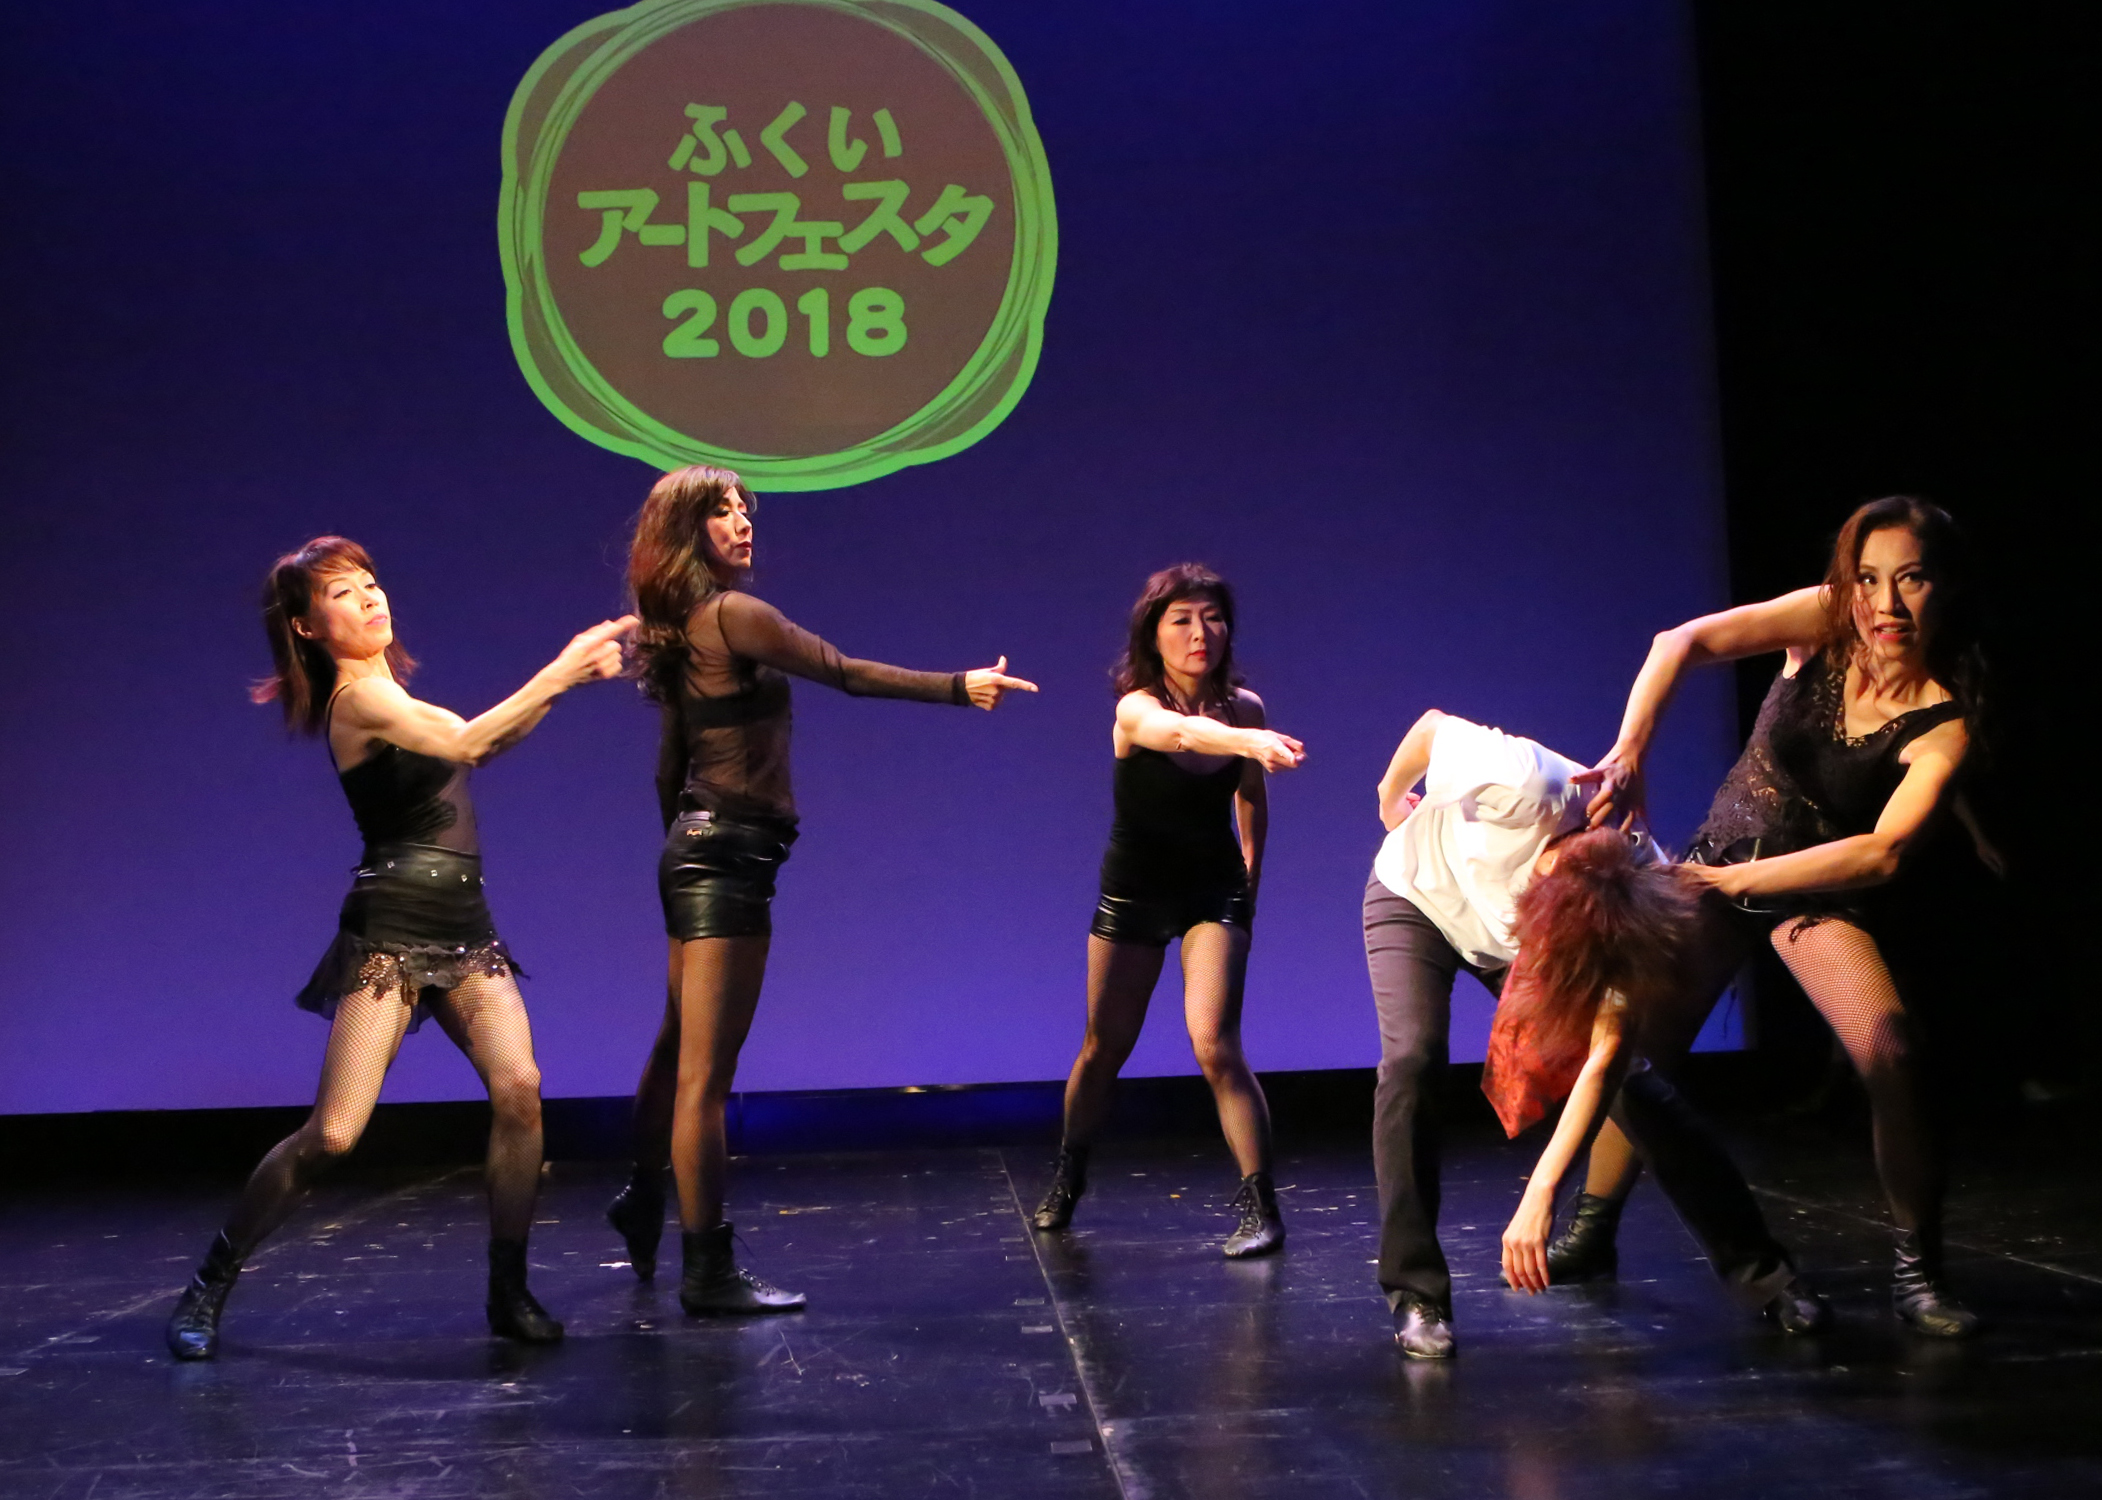 2018 Cell Block Tango